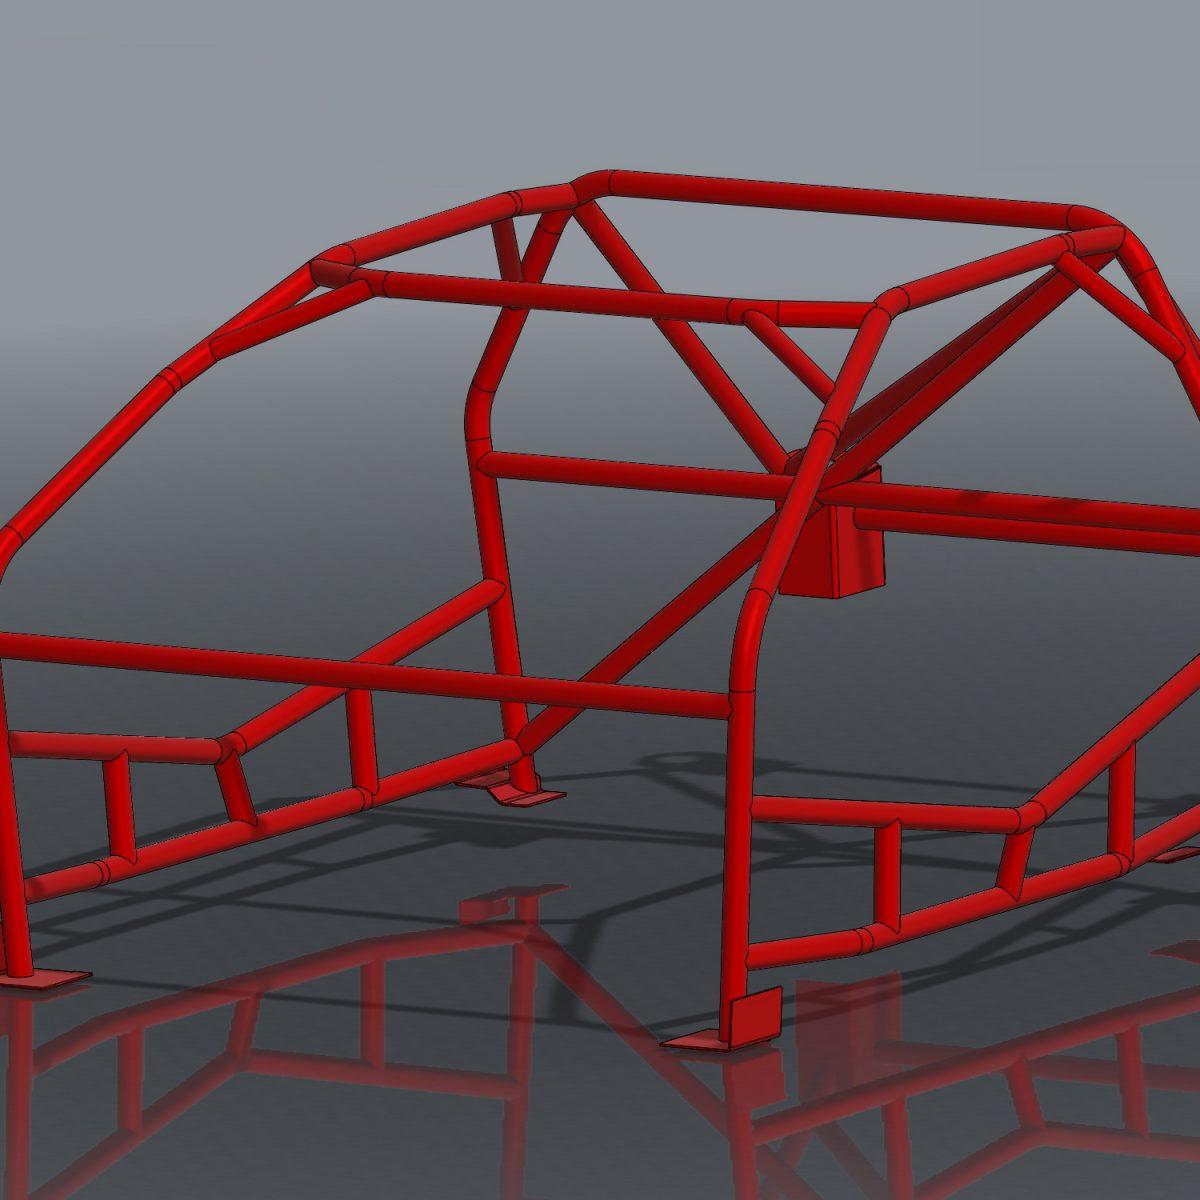 Ultra Tight S13 Bare Minimum Roll Cage Kit